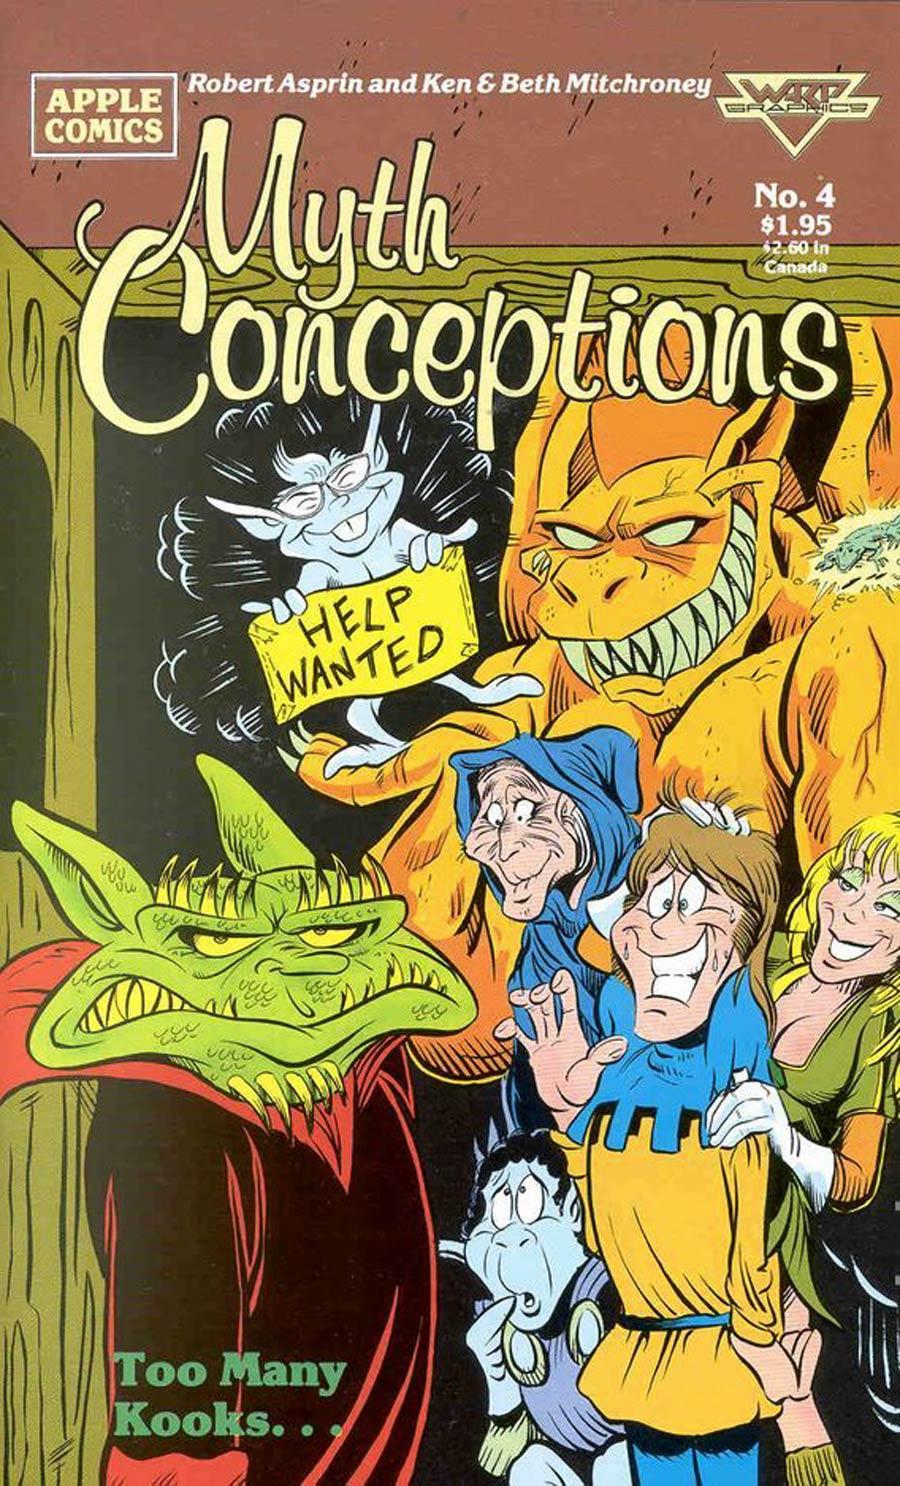 Myth Conceptions #4